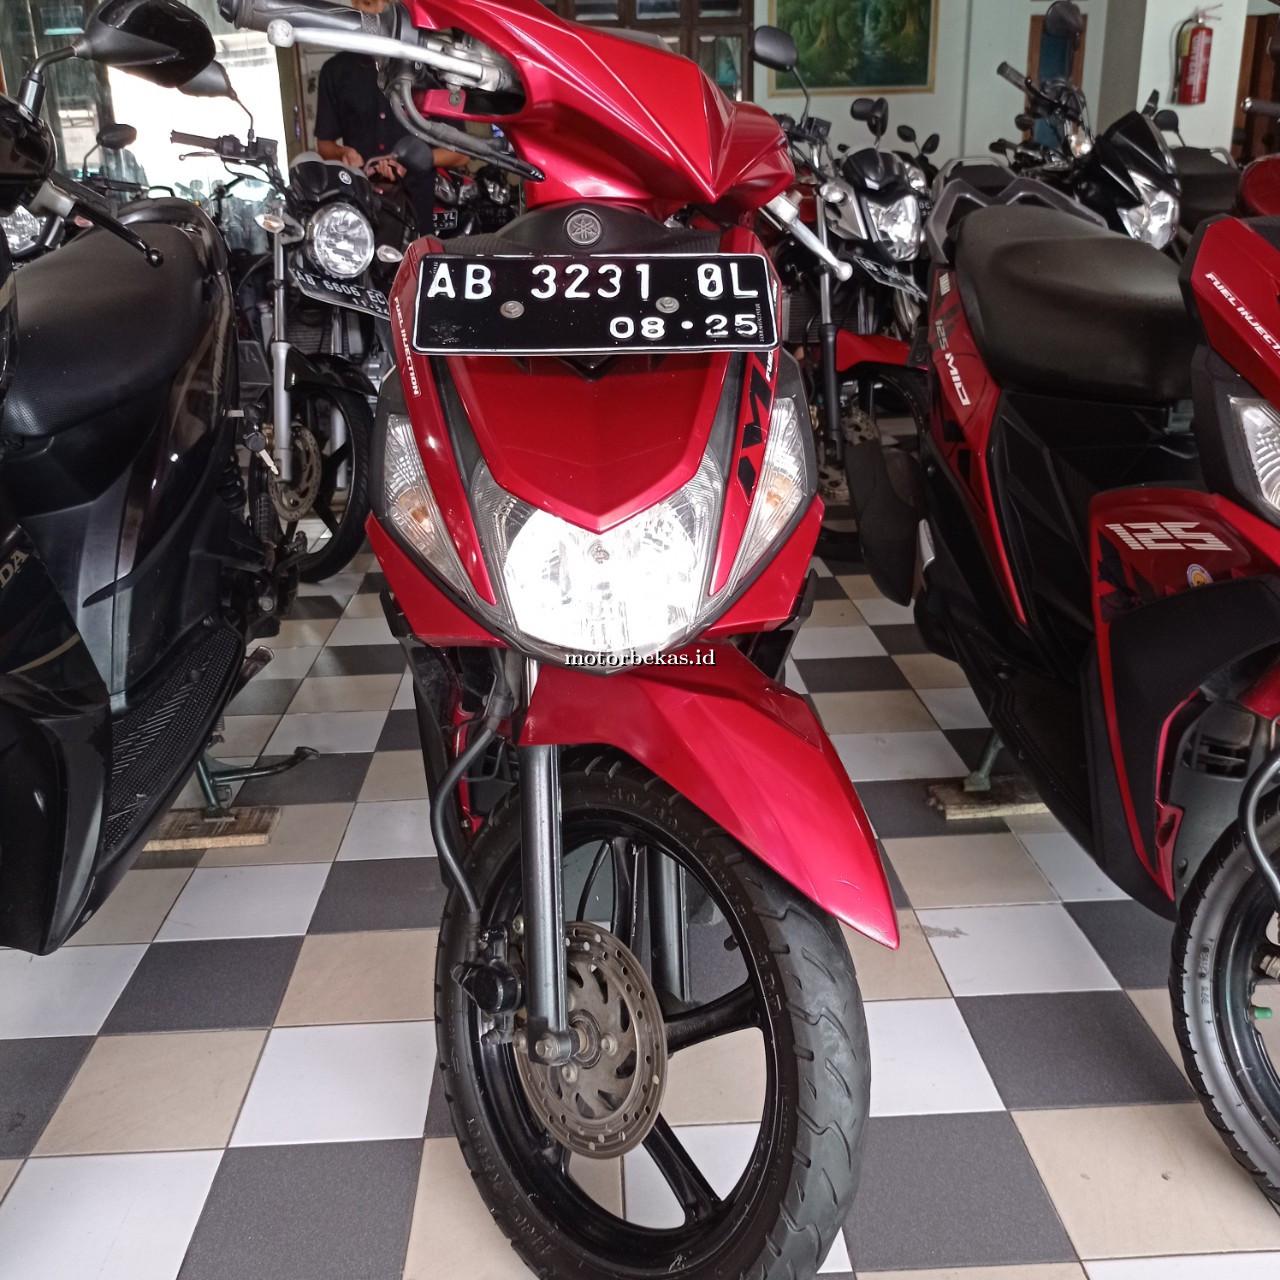 YAMAHA MIO M3 125  180 motorbekas.id